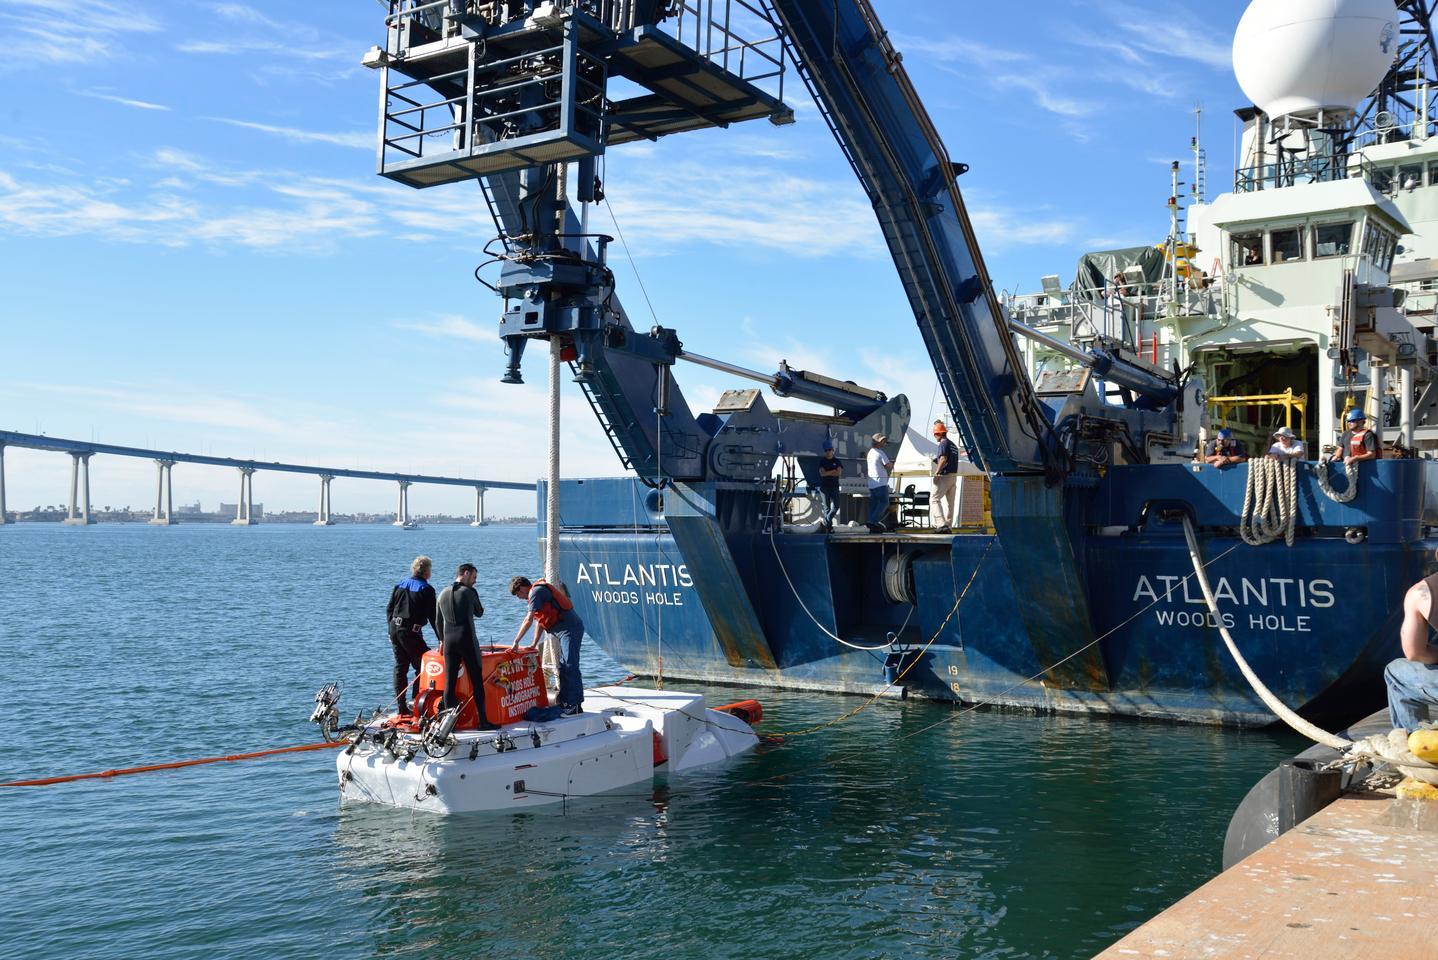 Alvin off the stern of the R/V Atlantis